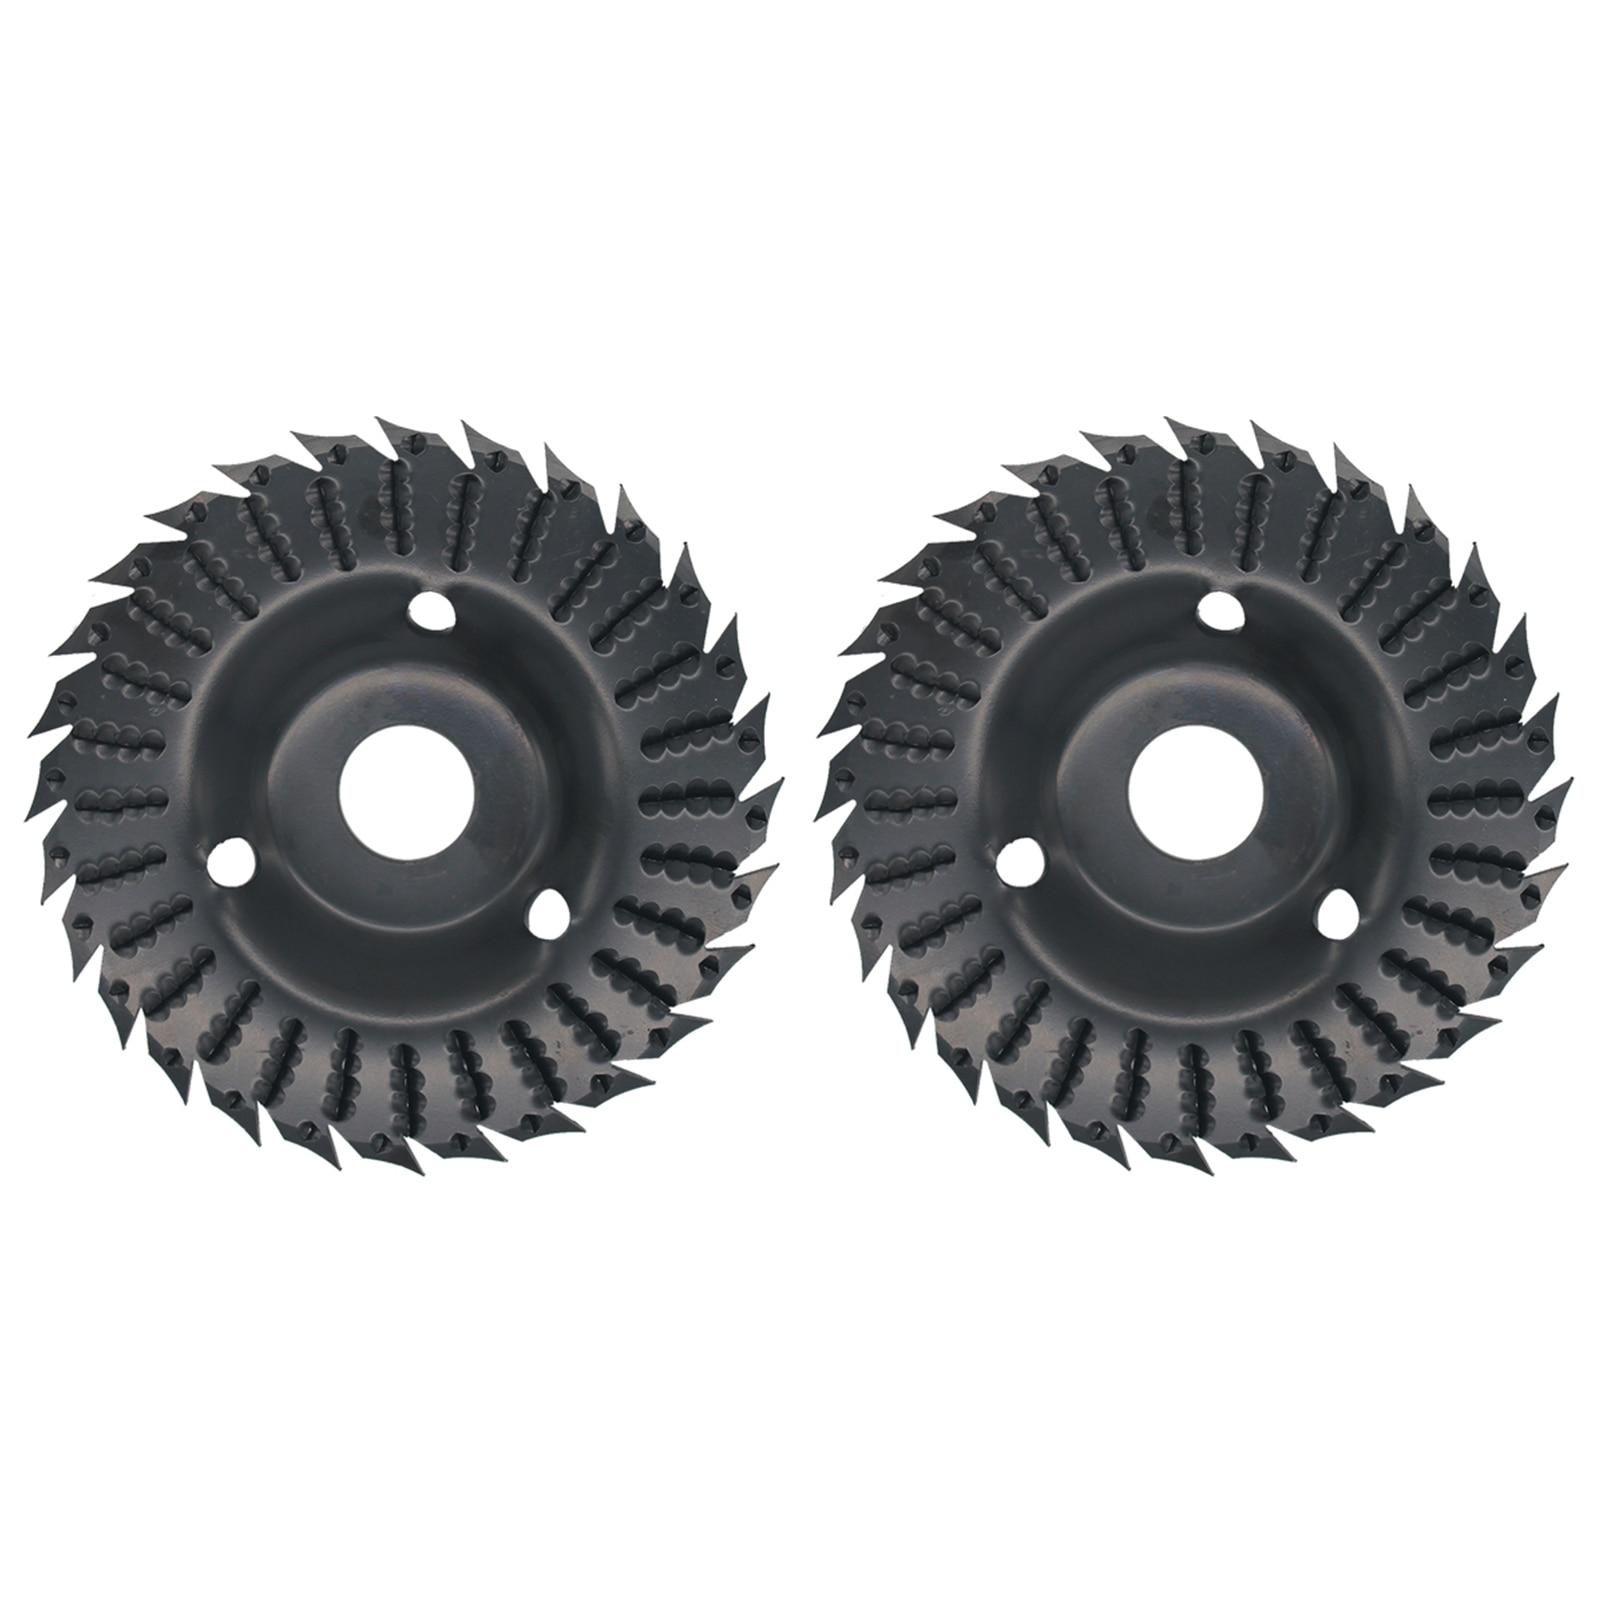 KKmoon 1pcs/2pcs Angle Grinder Grinding Disc 28 Teeth Wood Grinding Wheel Abrasive Disc Woodworking Wood Shaping Disc